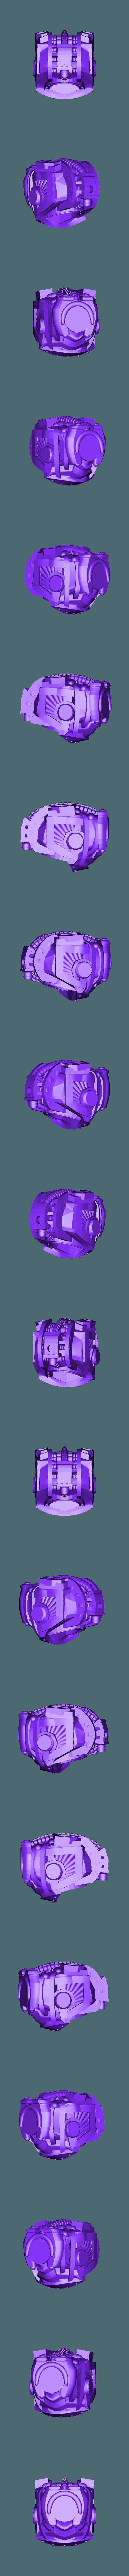 Torso_1.stl Download free STL file Cronusine Pattern Terminator Builder • 3D printing template, HappyDuck3D